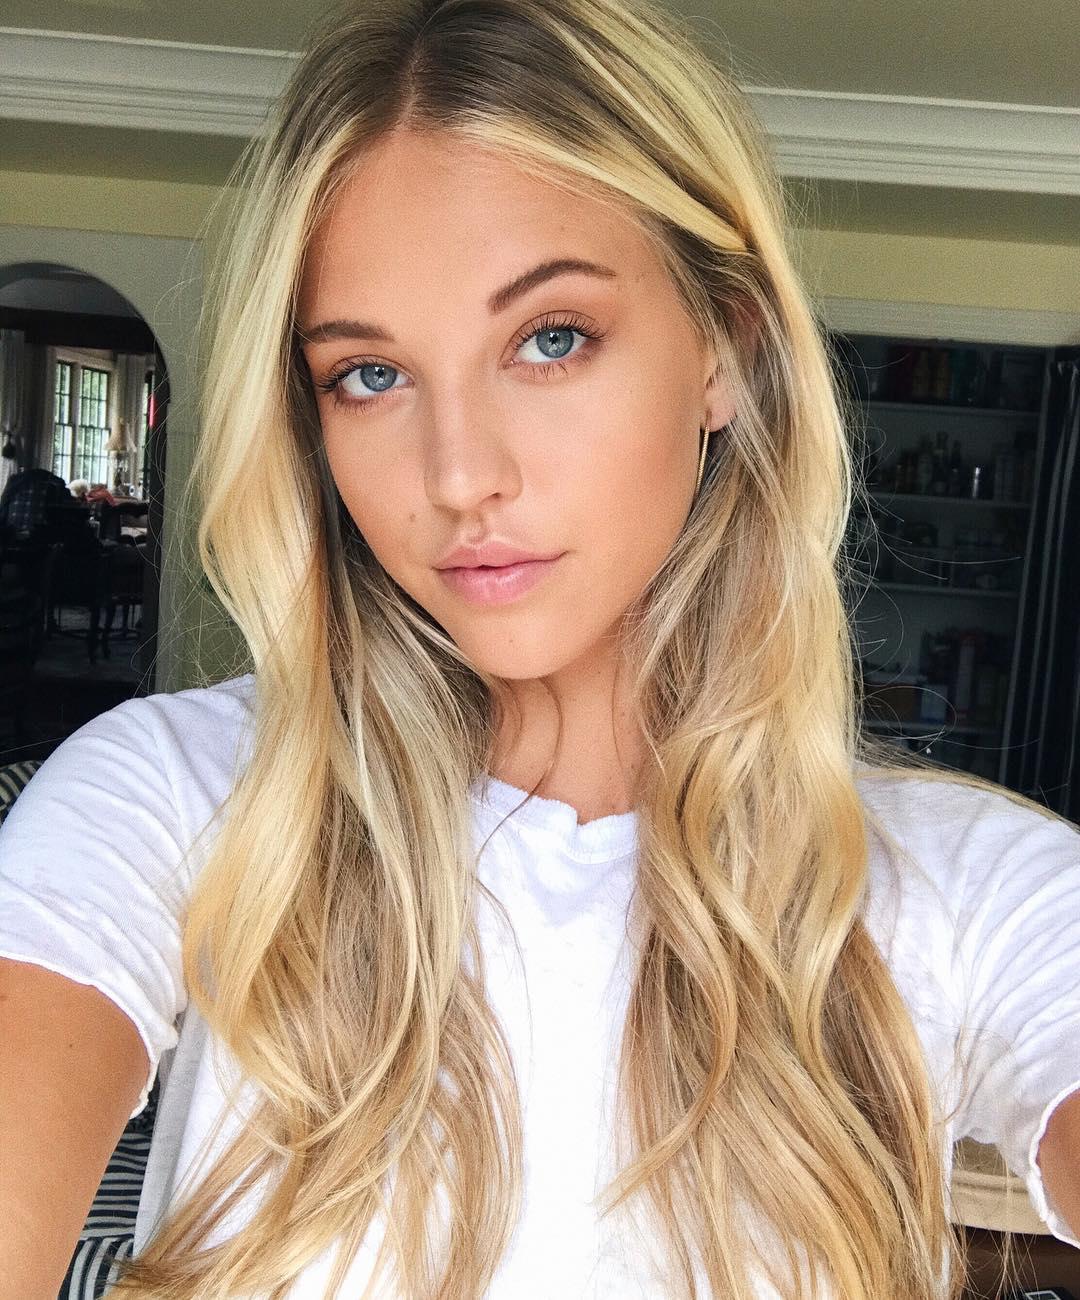 Kaitlynn-Bell-7